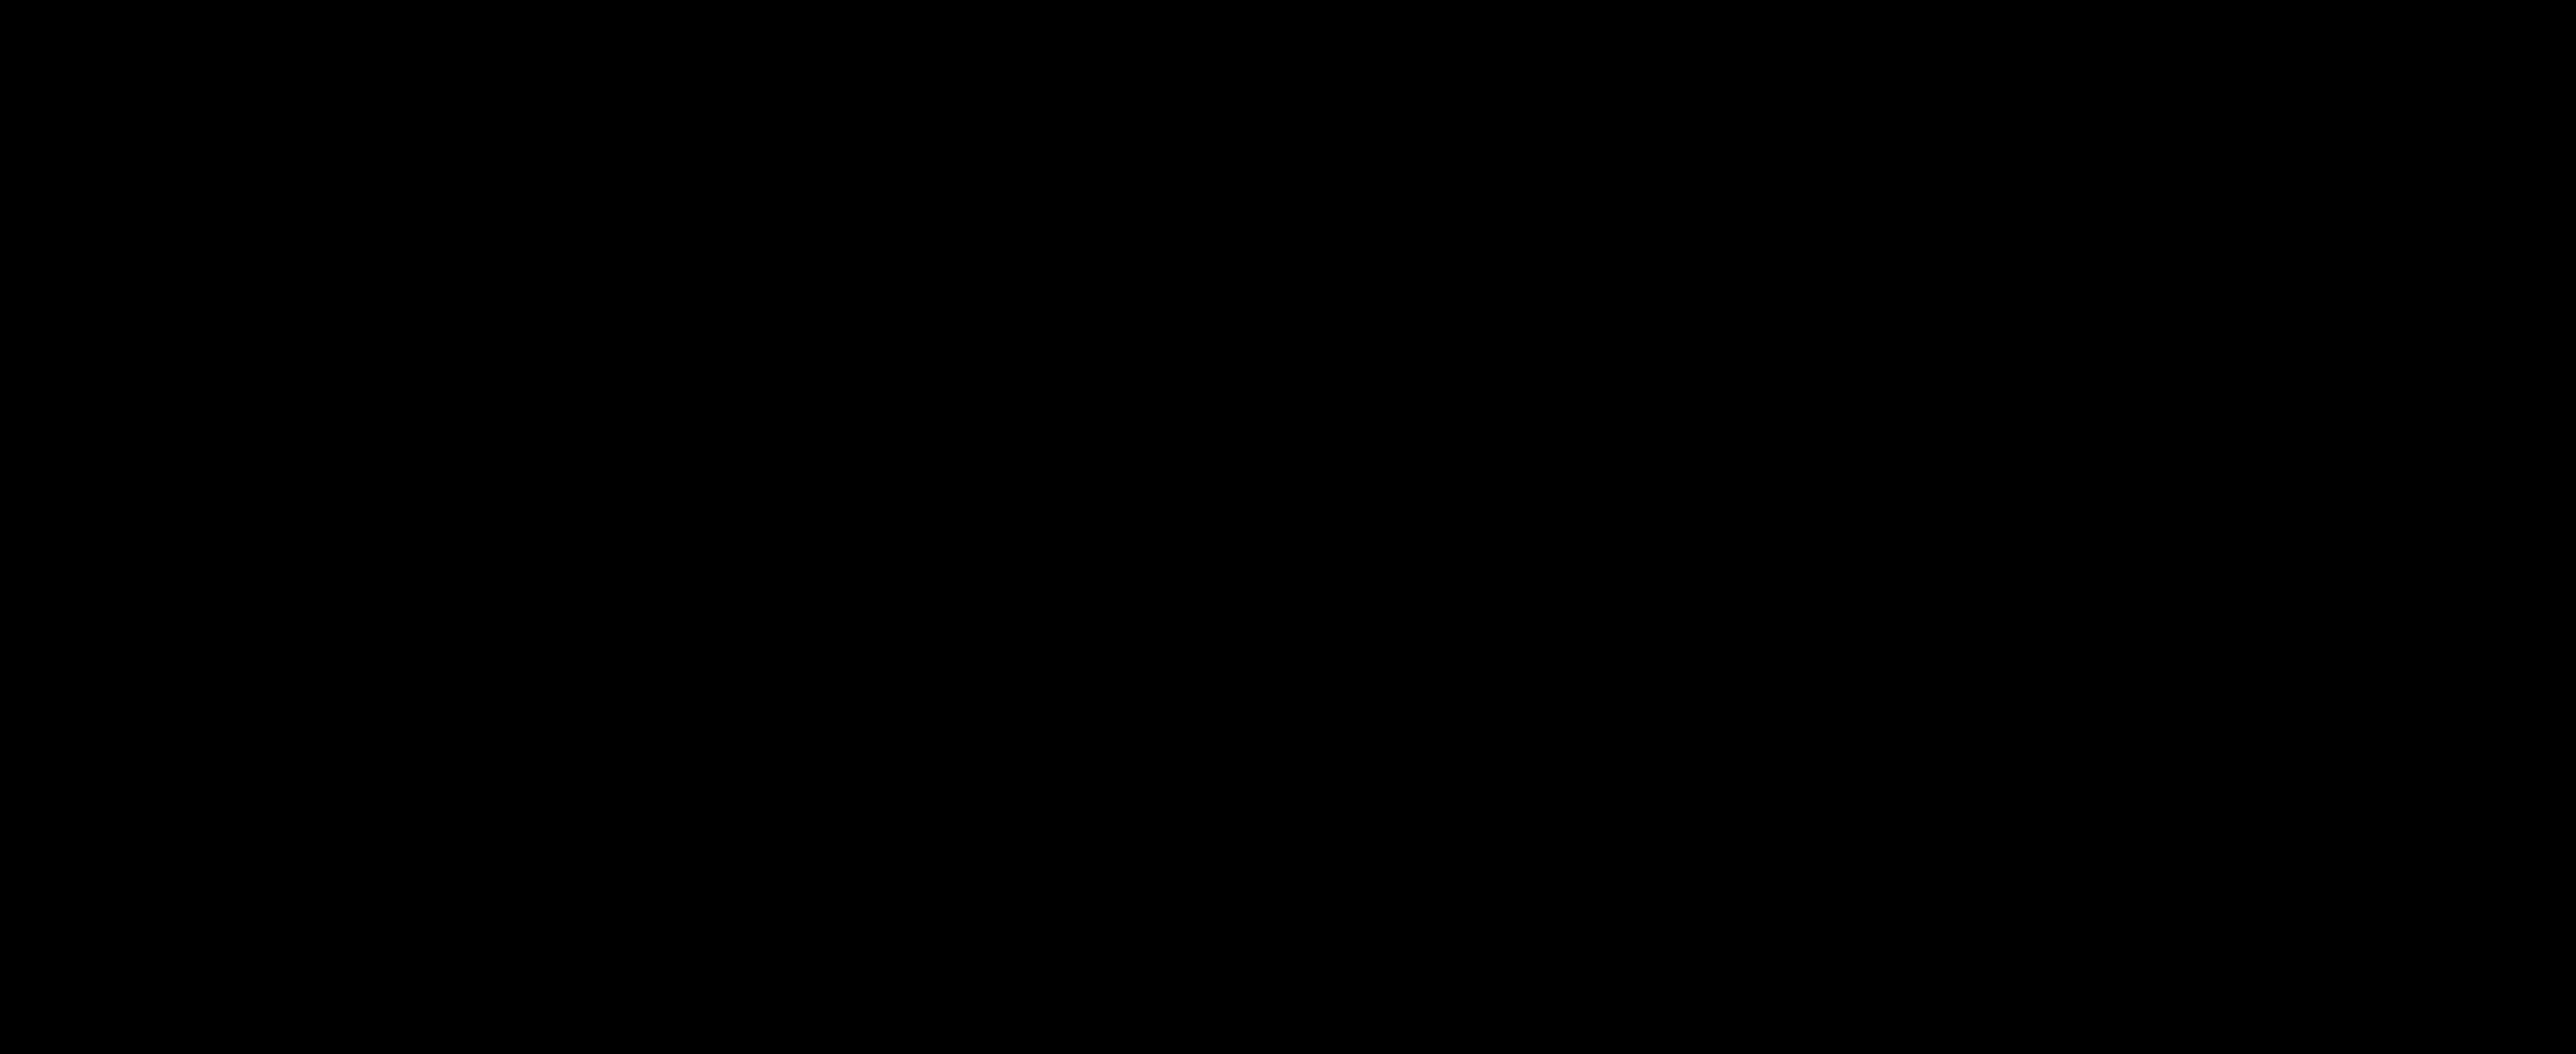 Theiascope